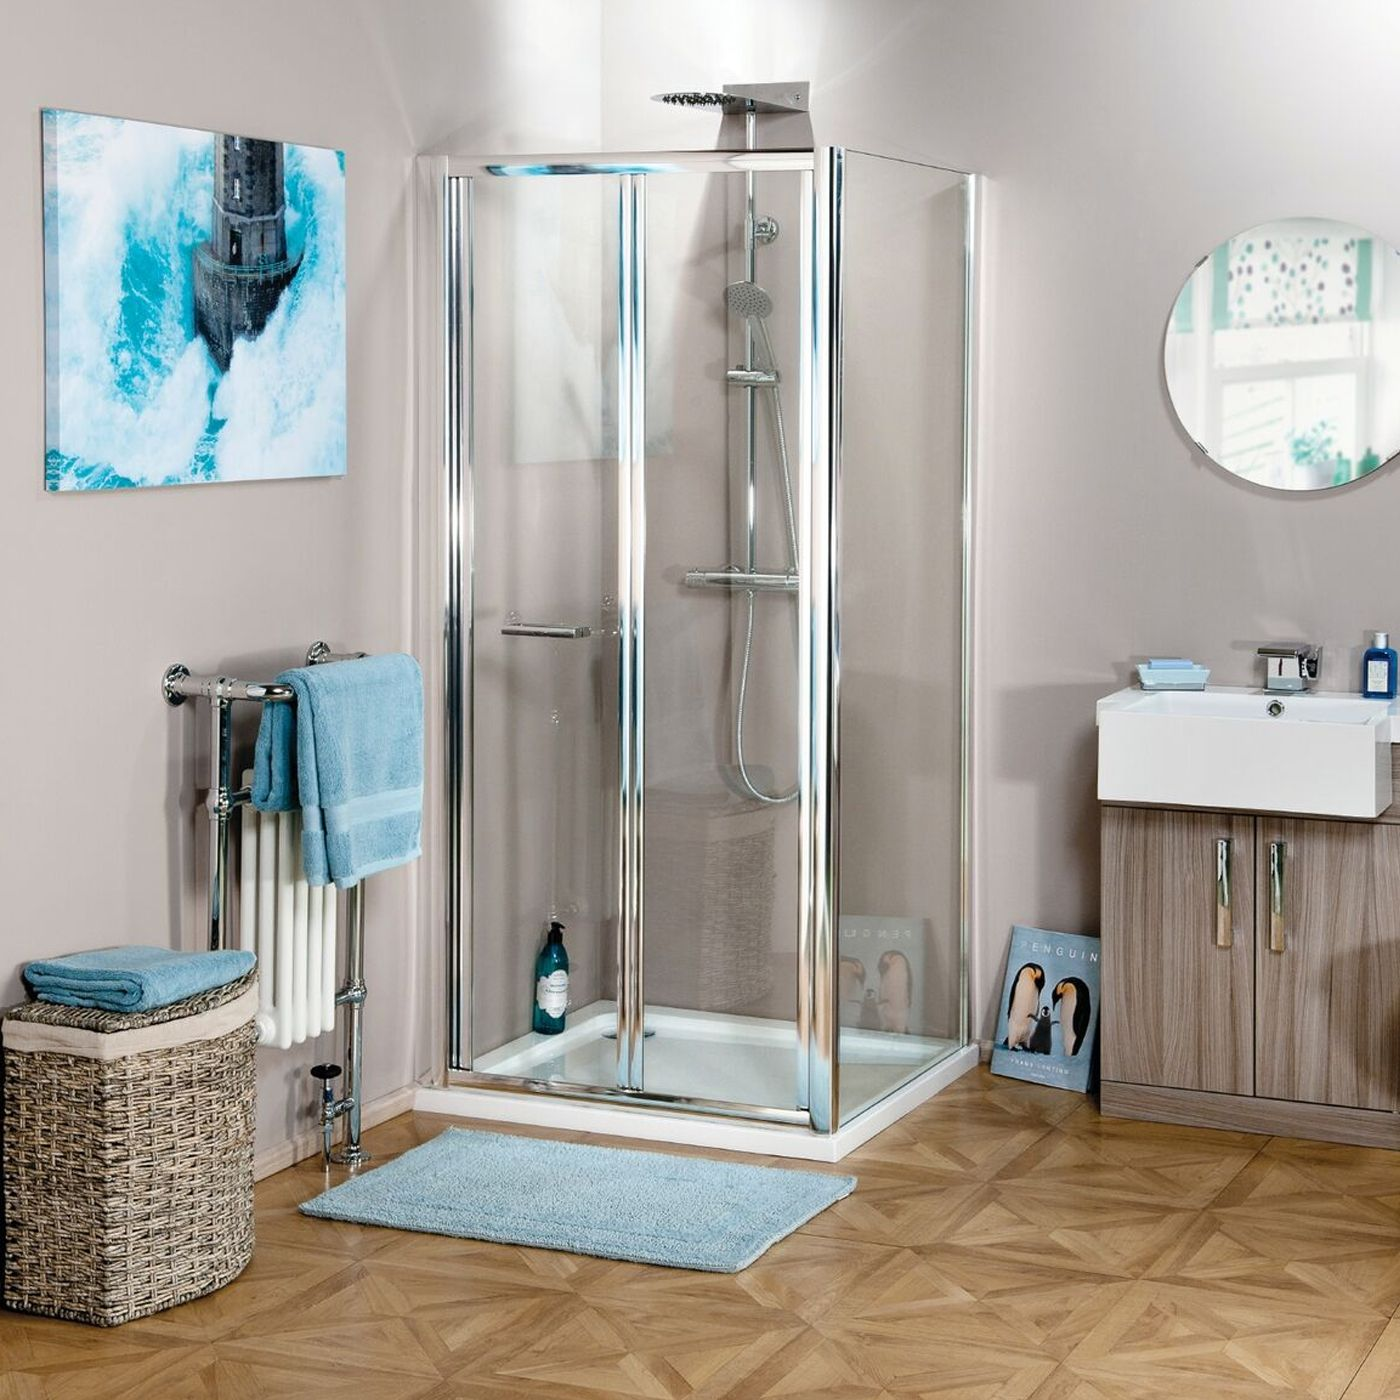 Cali Seis Bi Fold Shower Door Bfd76 760mm Chrome Clear Bifold Shower Door Shower Doors Heating And Plumbing